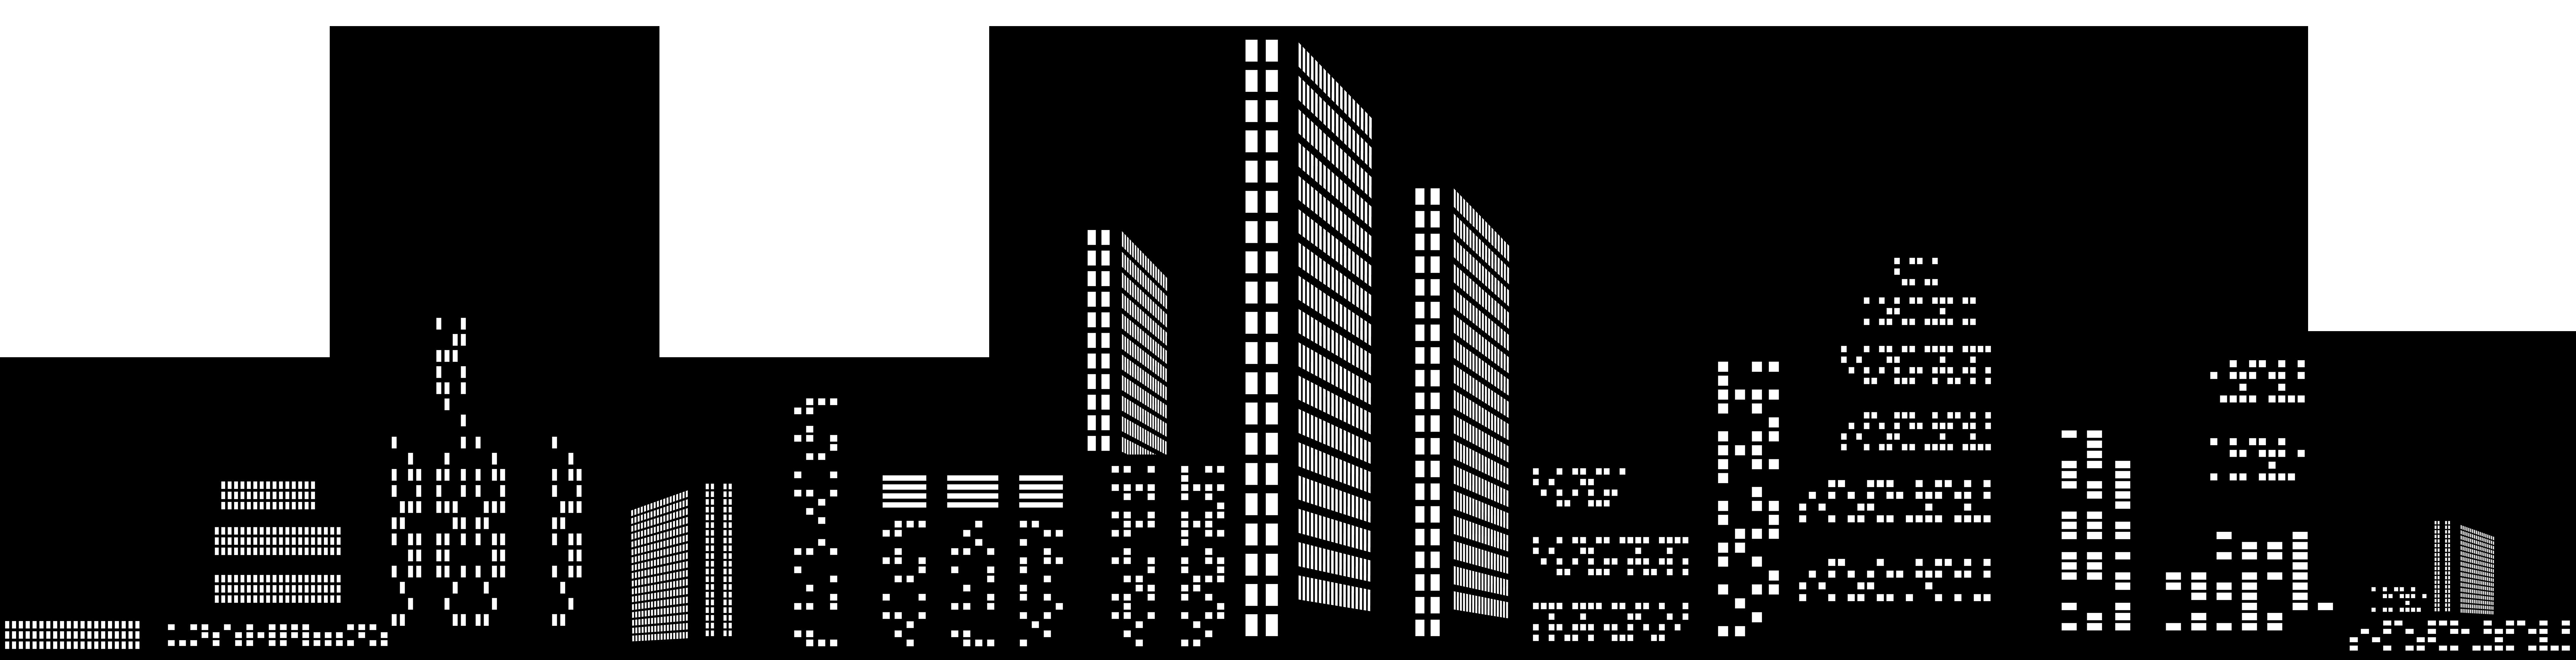 Cityscape Silhouette Clip Art PNG Image.